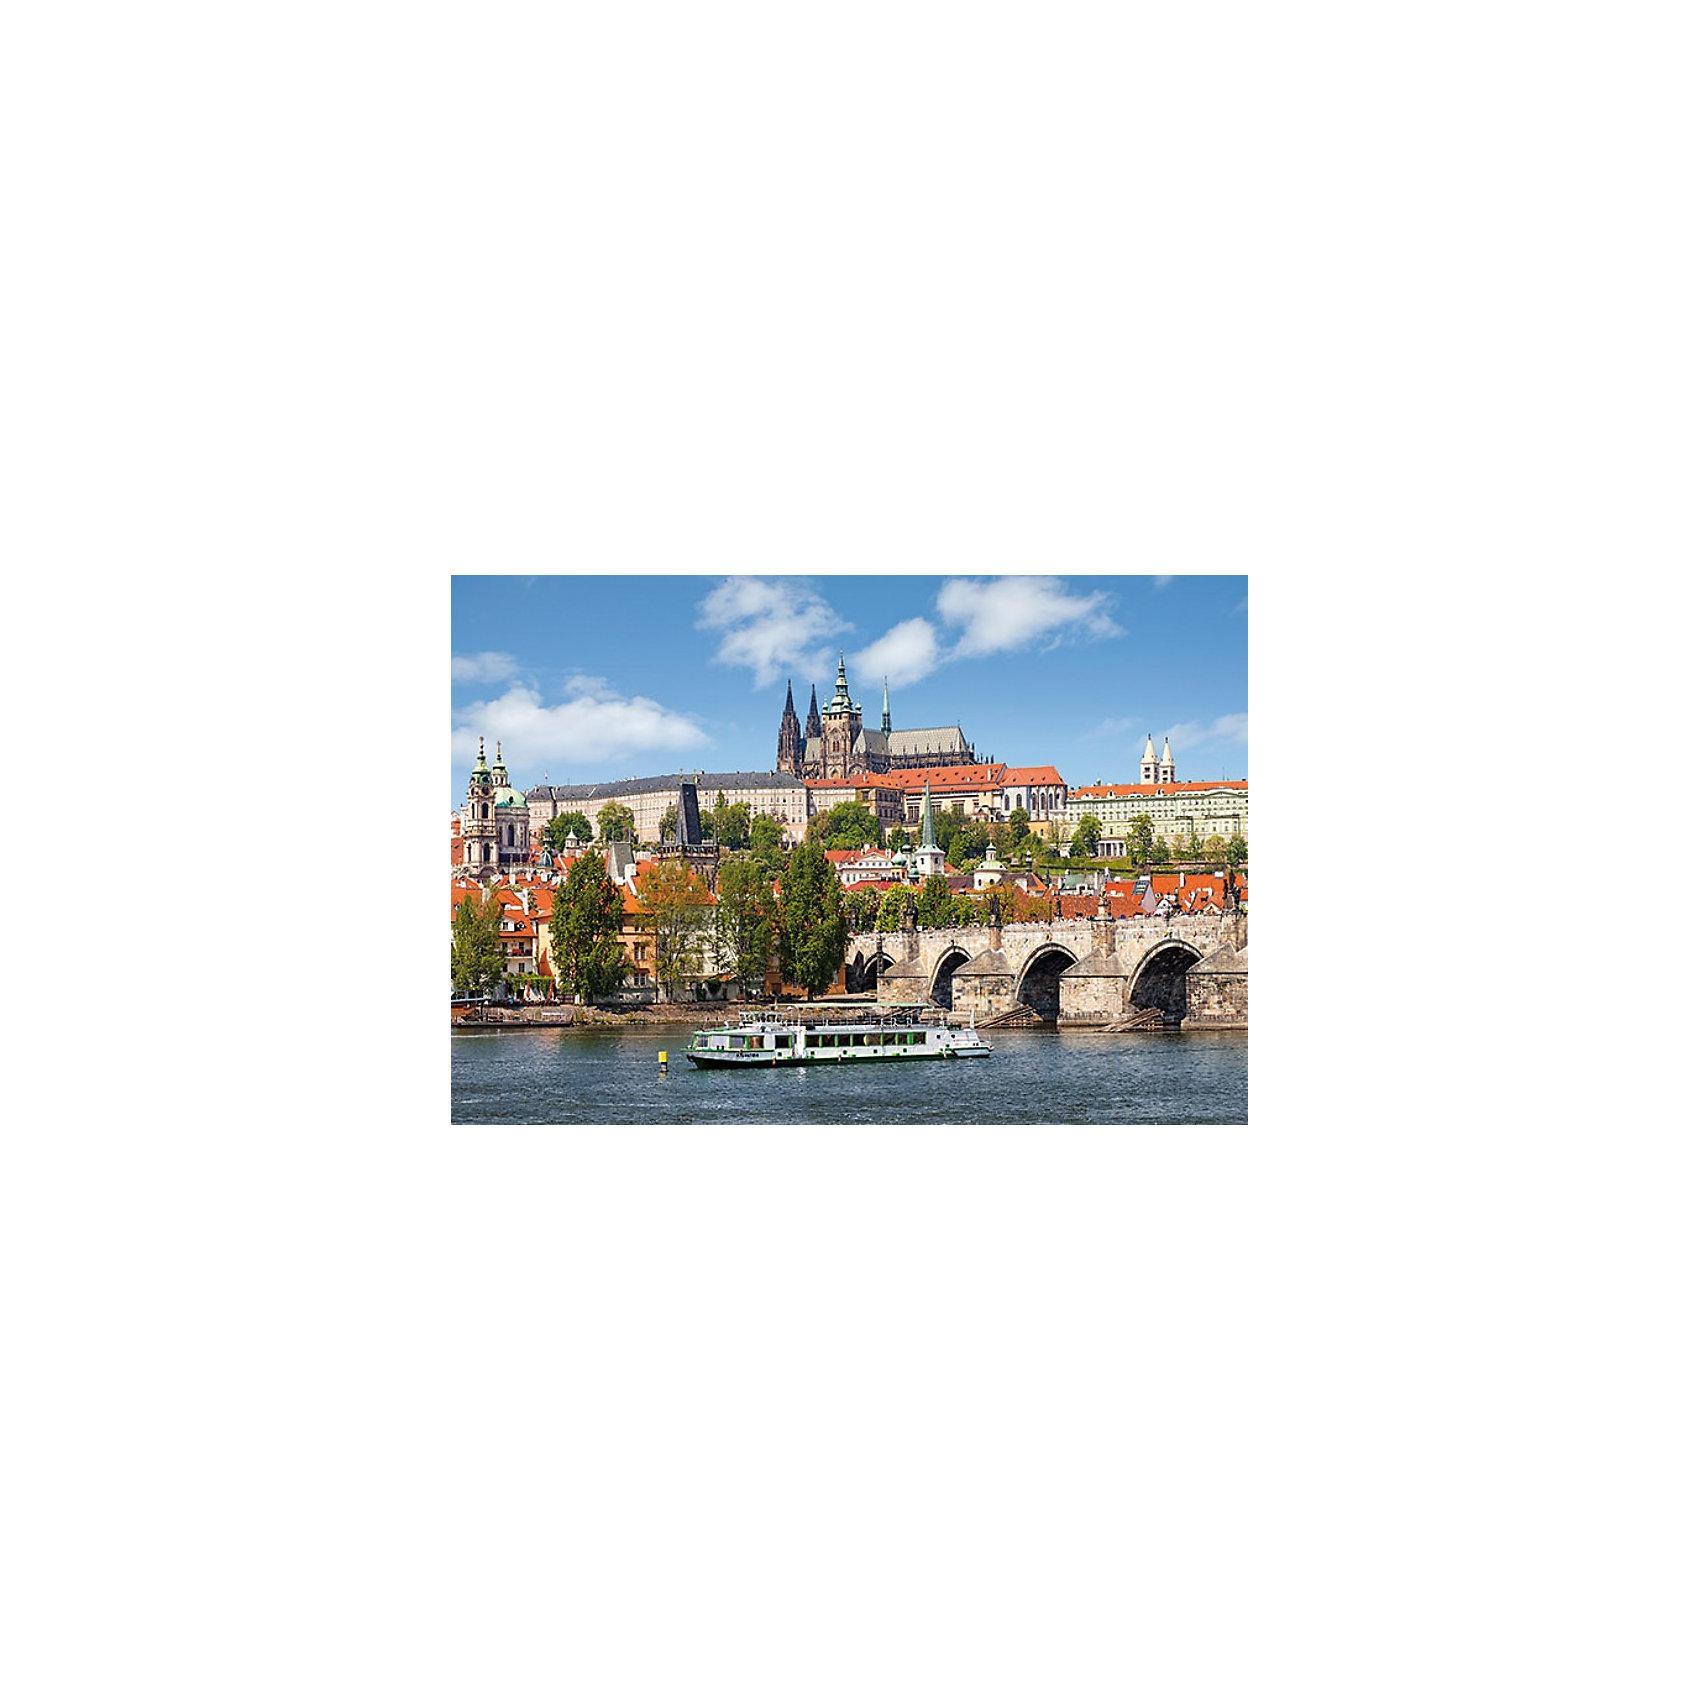 Castorland Пазлы Прага, Чехия, 1000 деталей, Castorland partaker 1u firewall server security firewall d525 with intel pci e 1000m 4 82583v 2gb ram 32gb ssd pfsense router